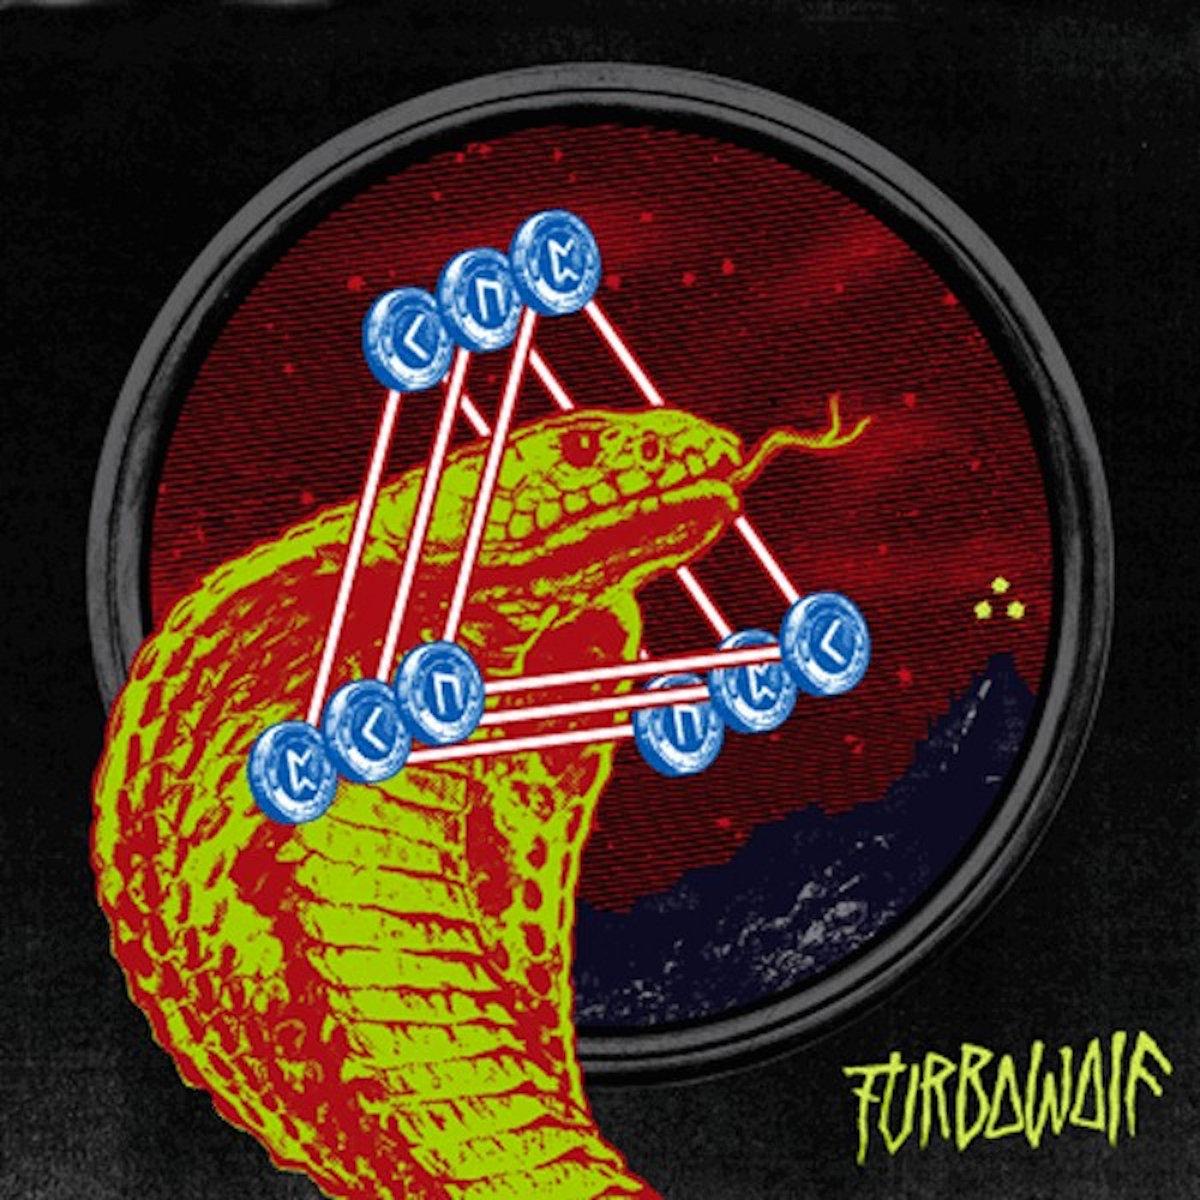 Turbowolf - s/t LP